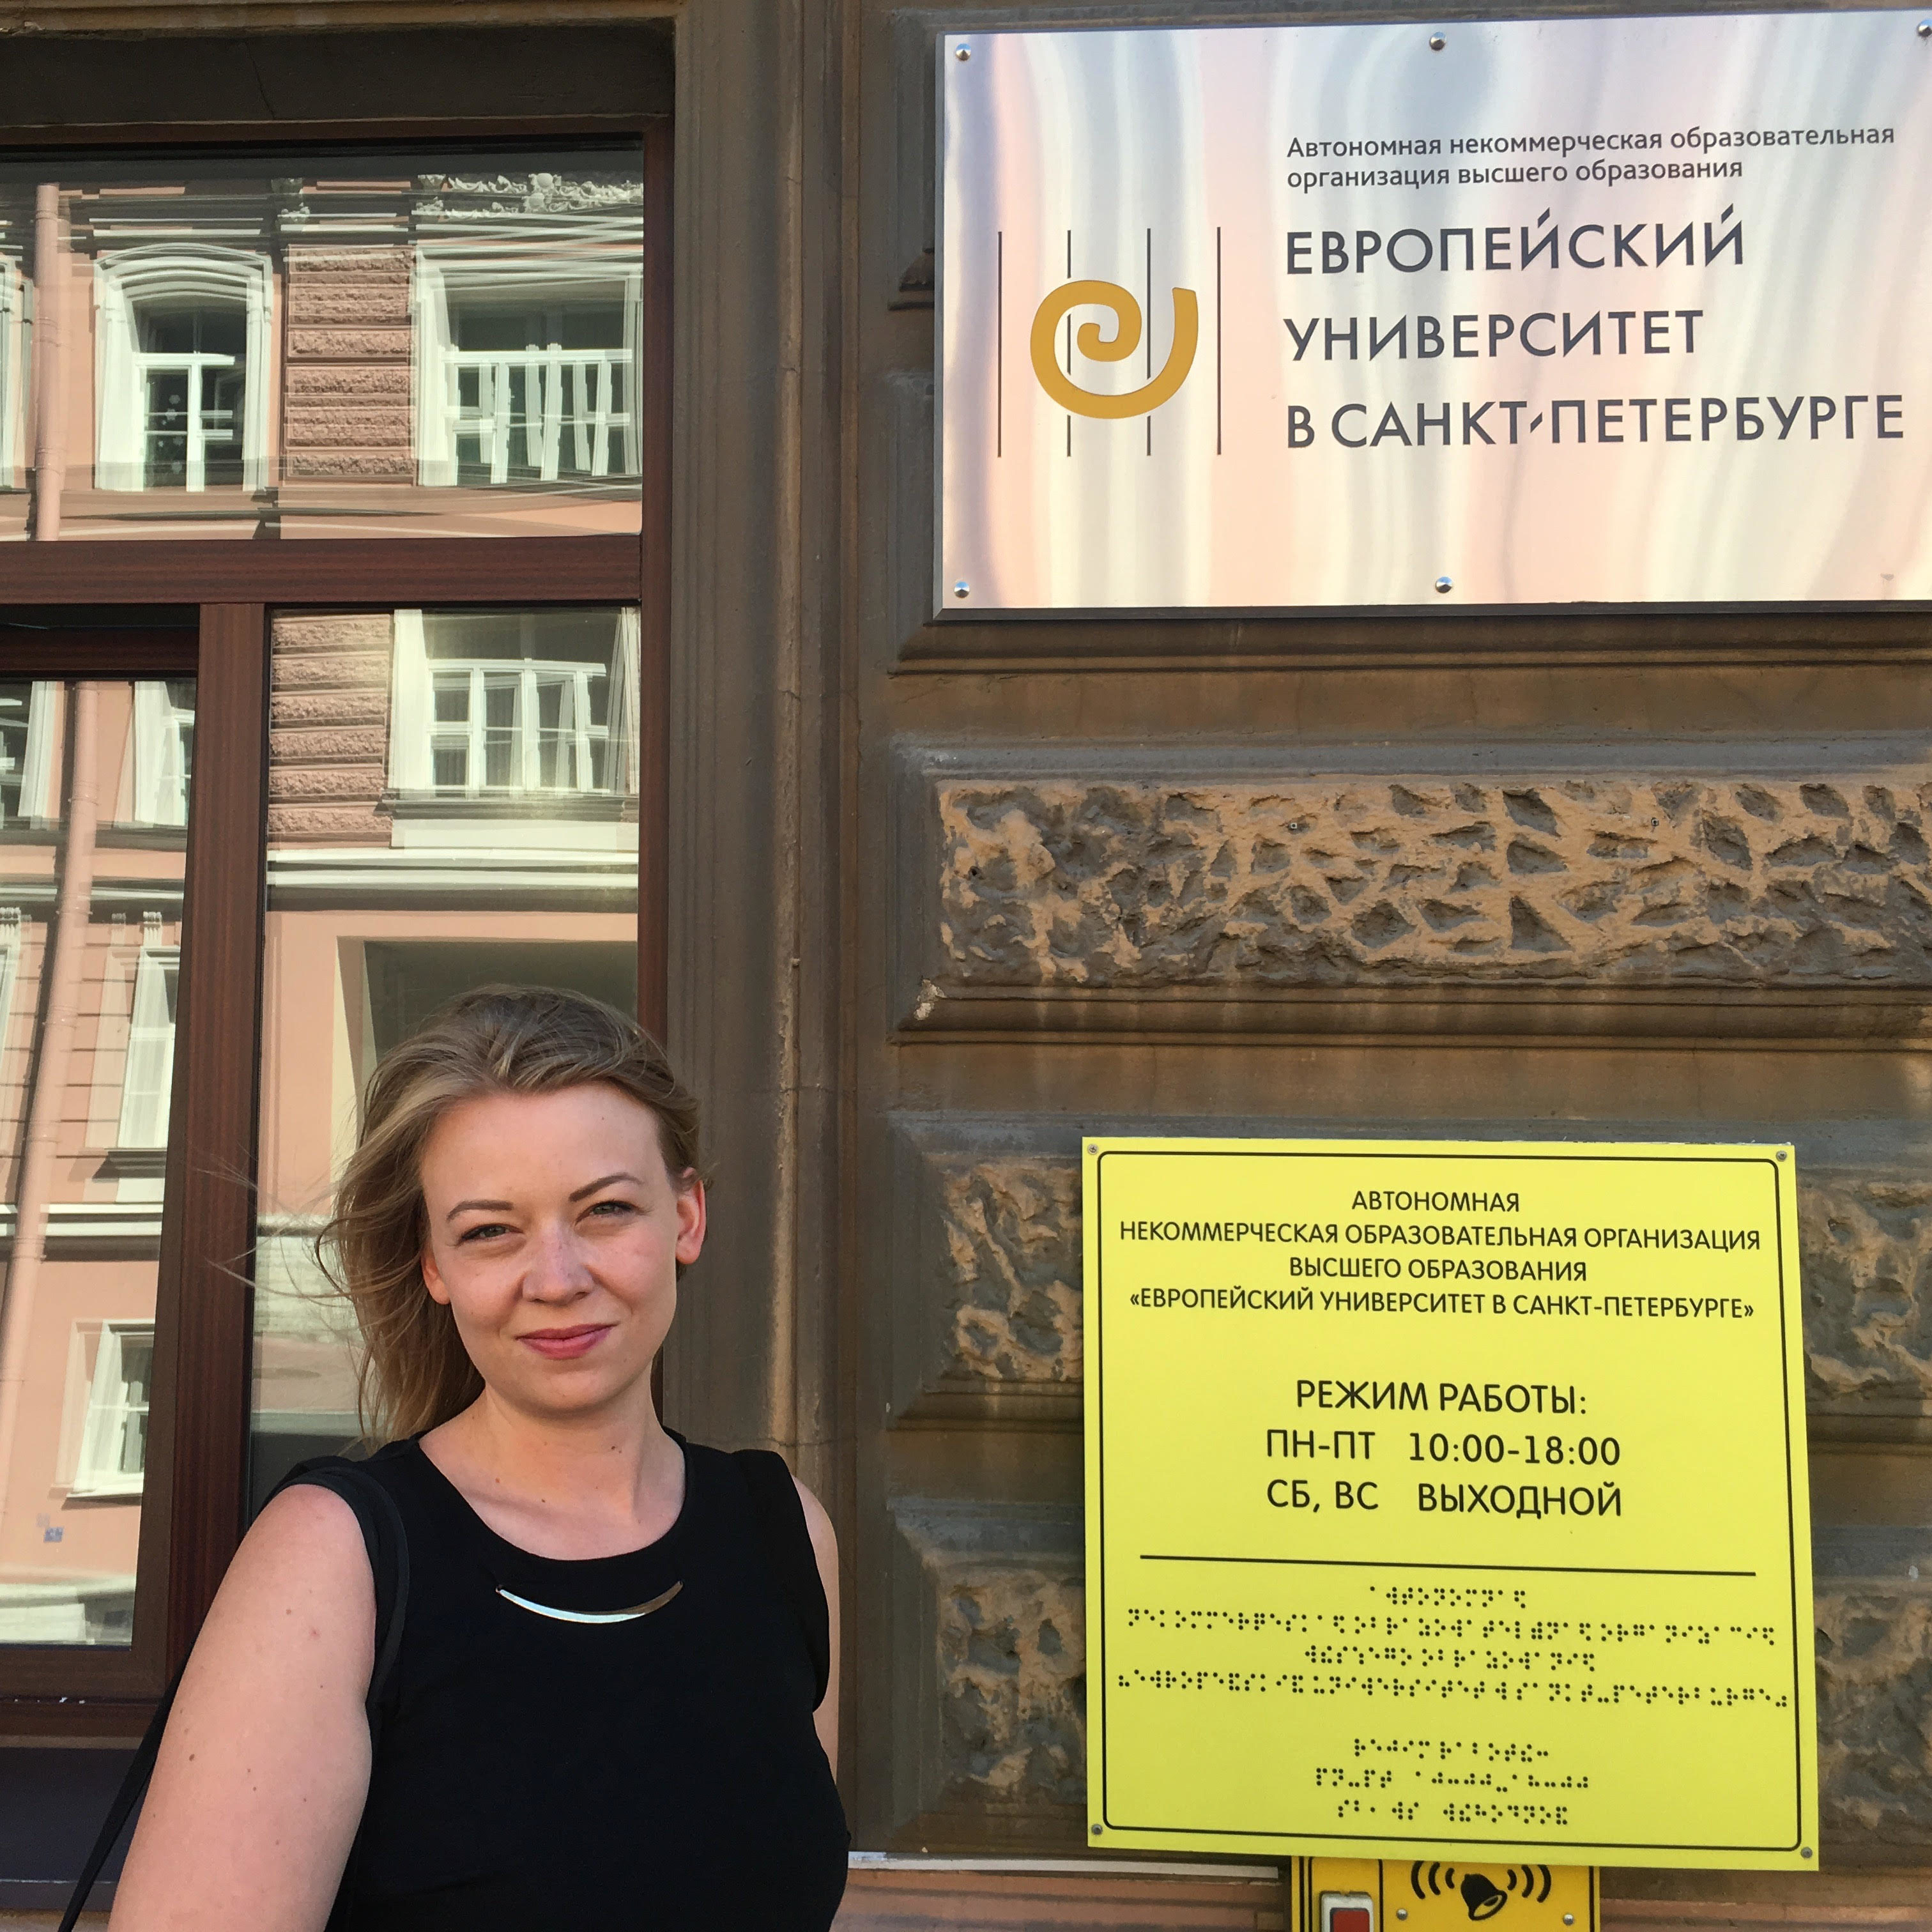 Iida Tikka outside a Russian agency building